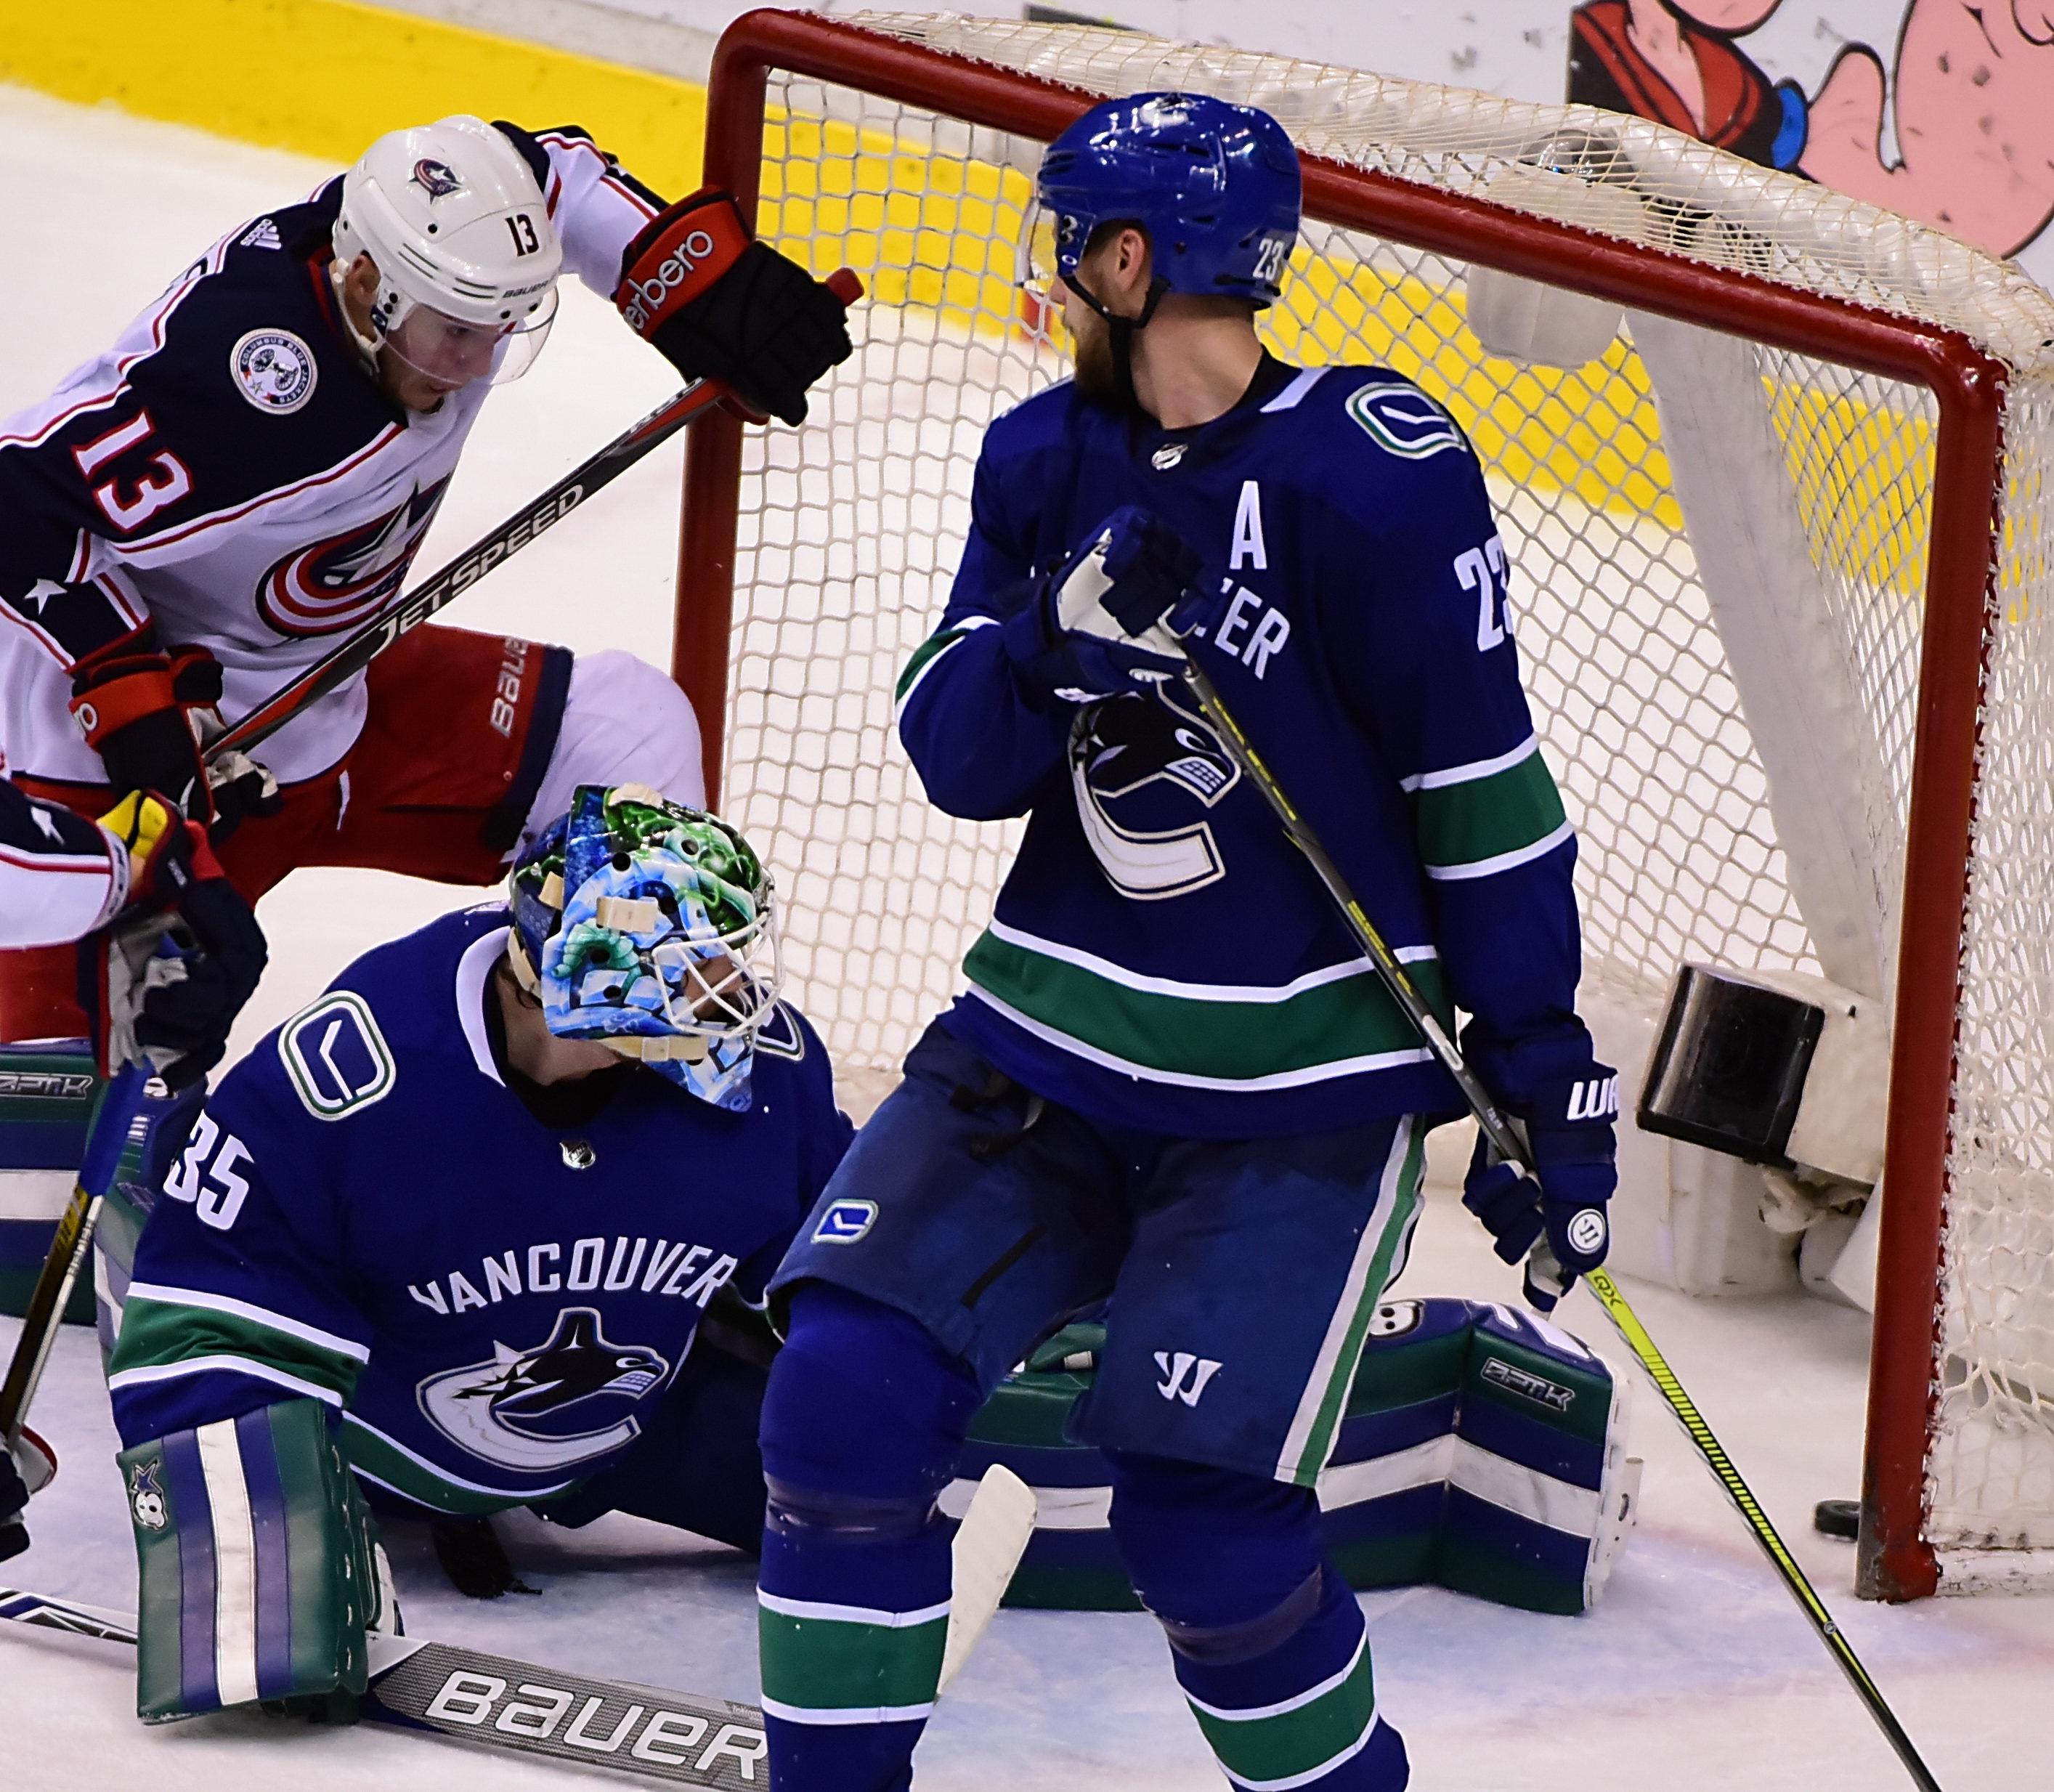 NHL: Columbus Blue Jackets at Vancouver Canucks